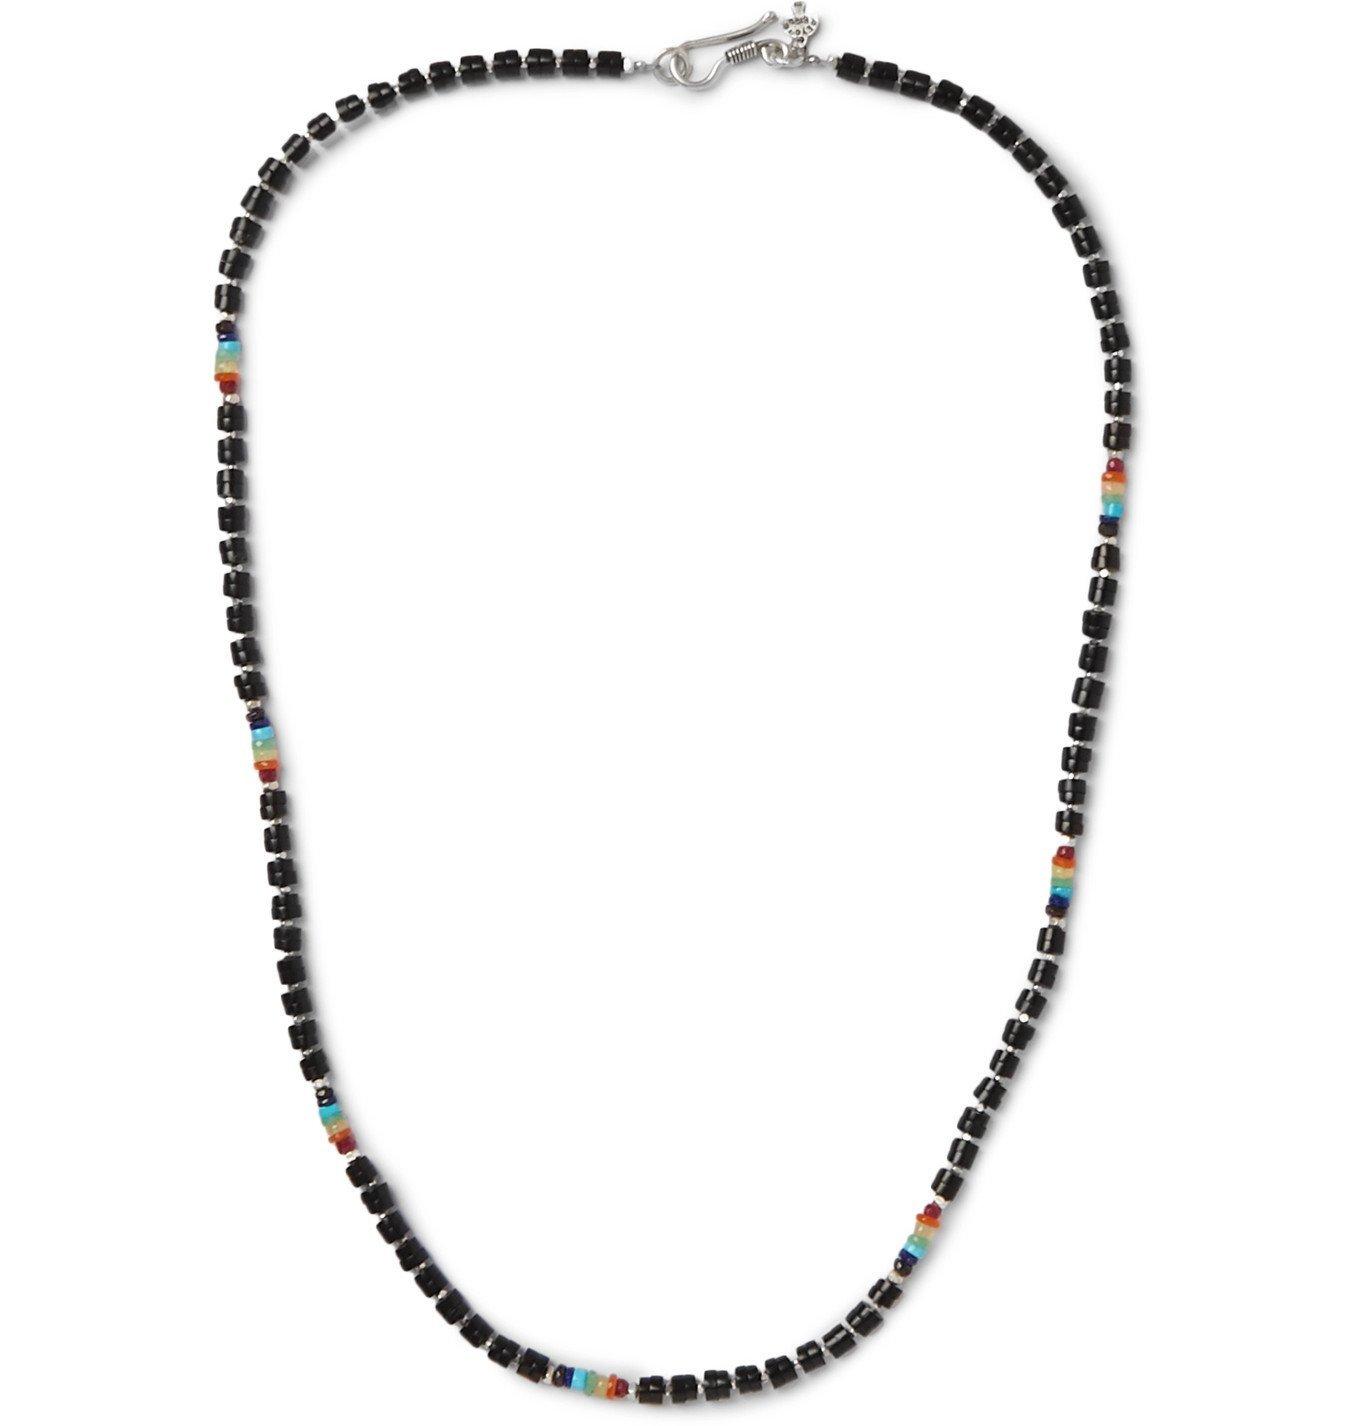 Photo: Peyote Bird - Multi-Stone Beaded Sterling Silver Necklace - Black